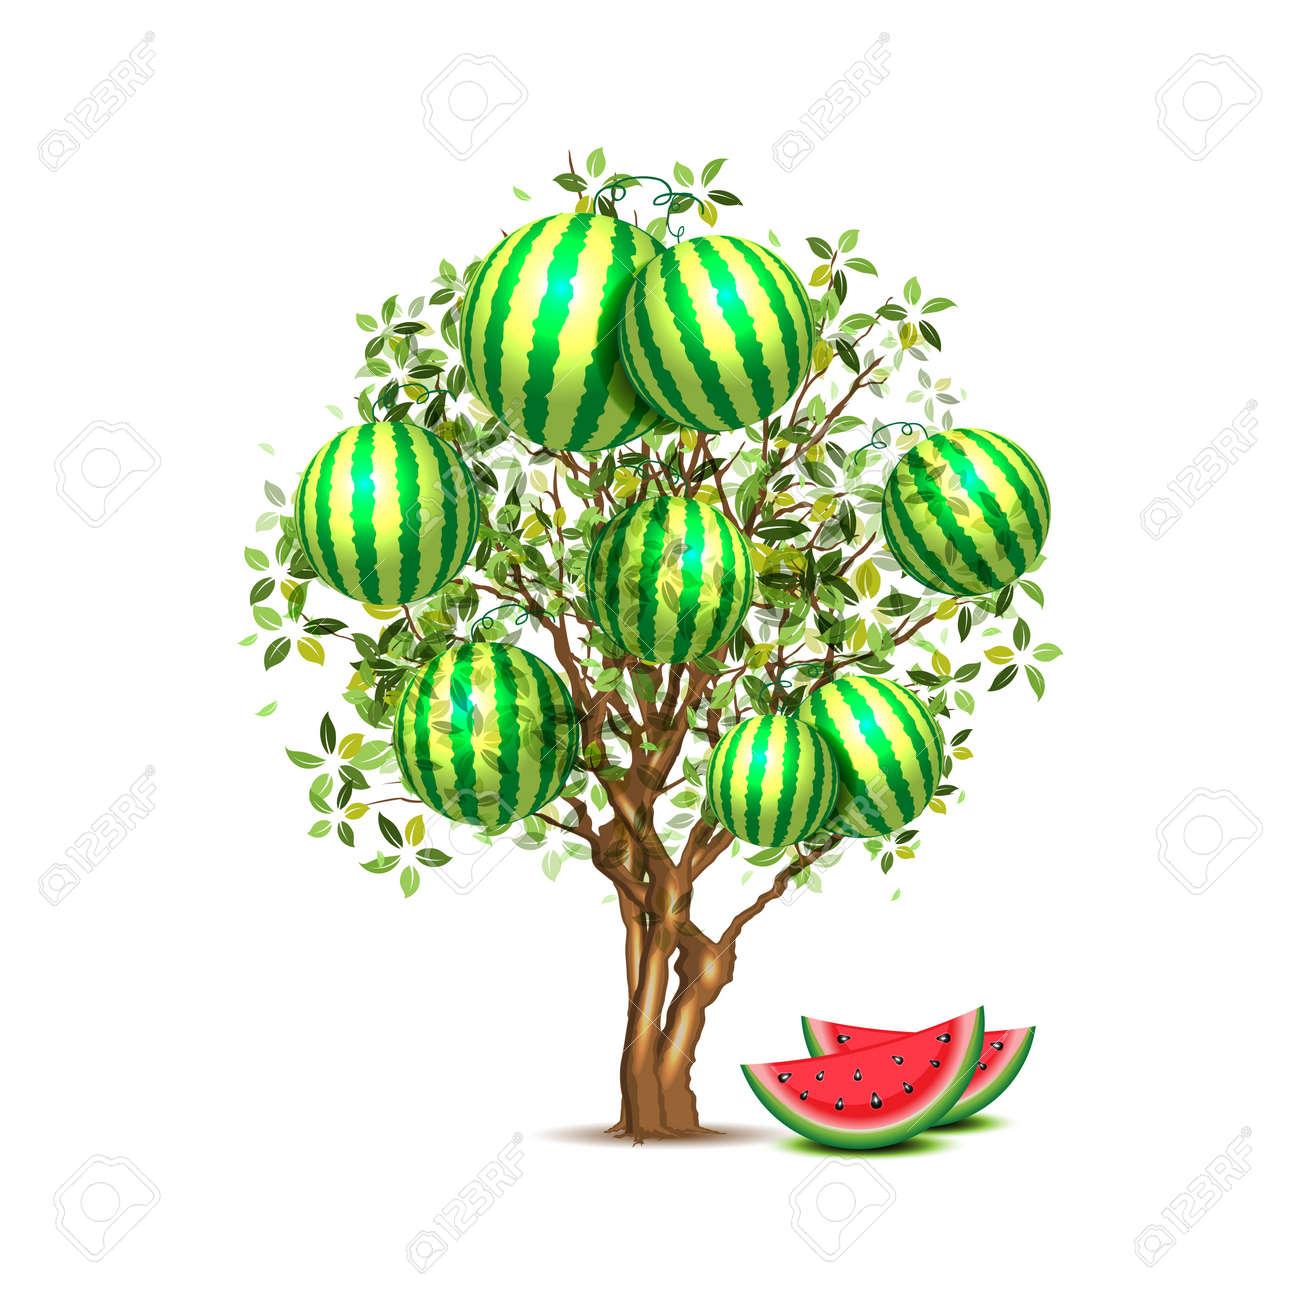 arbre de la pastèque clip art libres de droits , vecteurs et